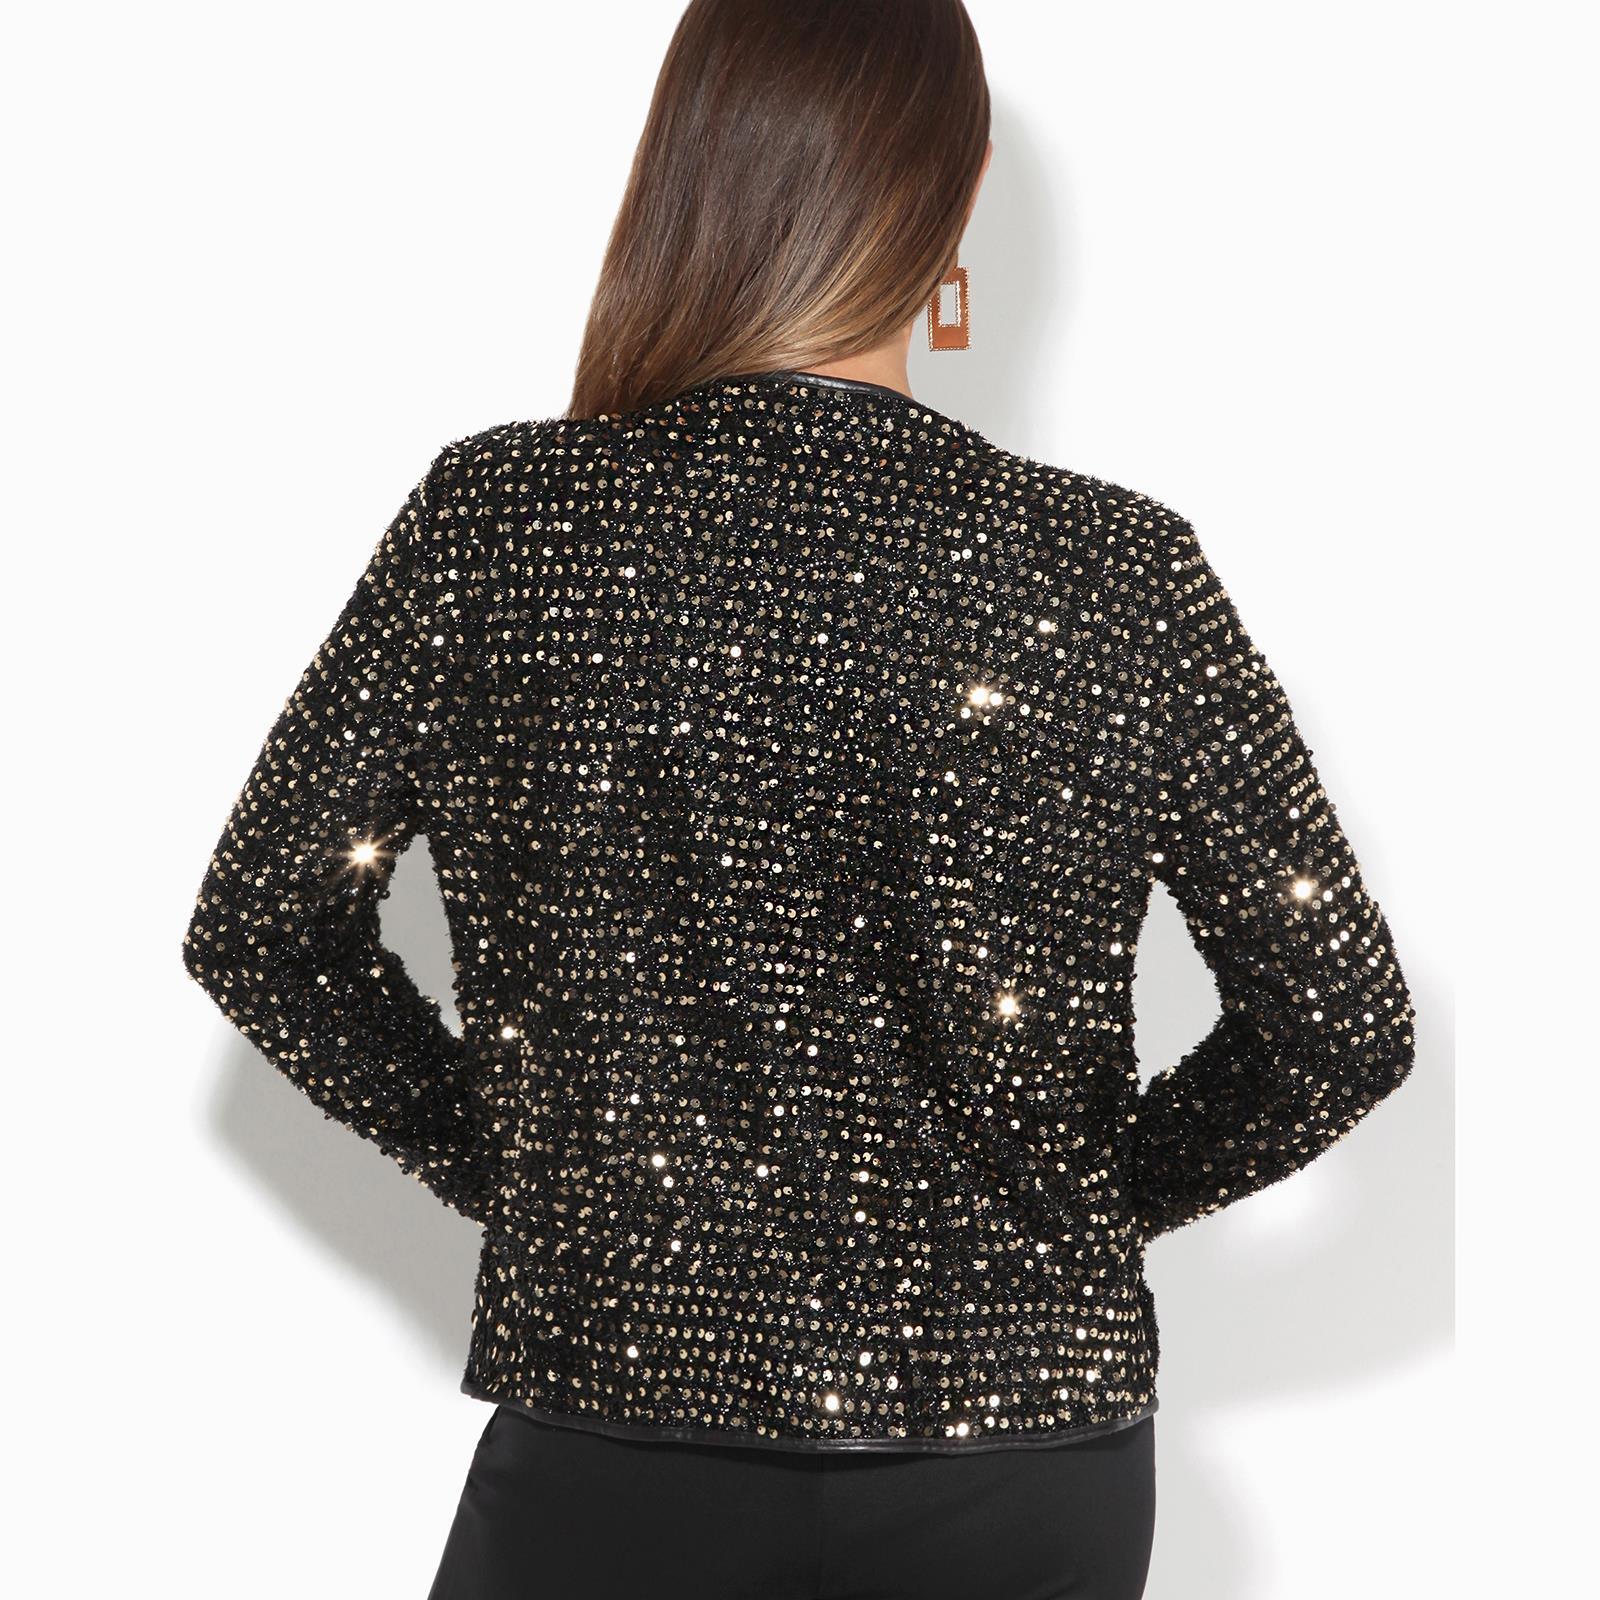 Womens-Sequin-Shrug-Bolero-Cropped-Top-Jacket-Blazer-Party-Evening-Coat thumbnail 10